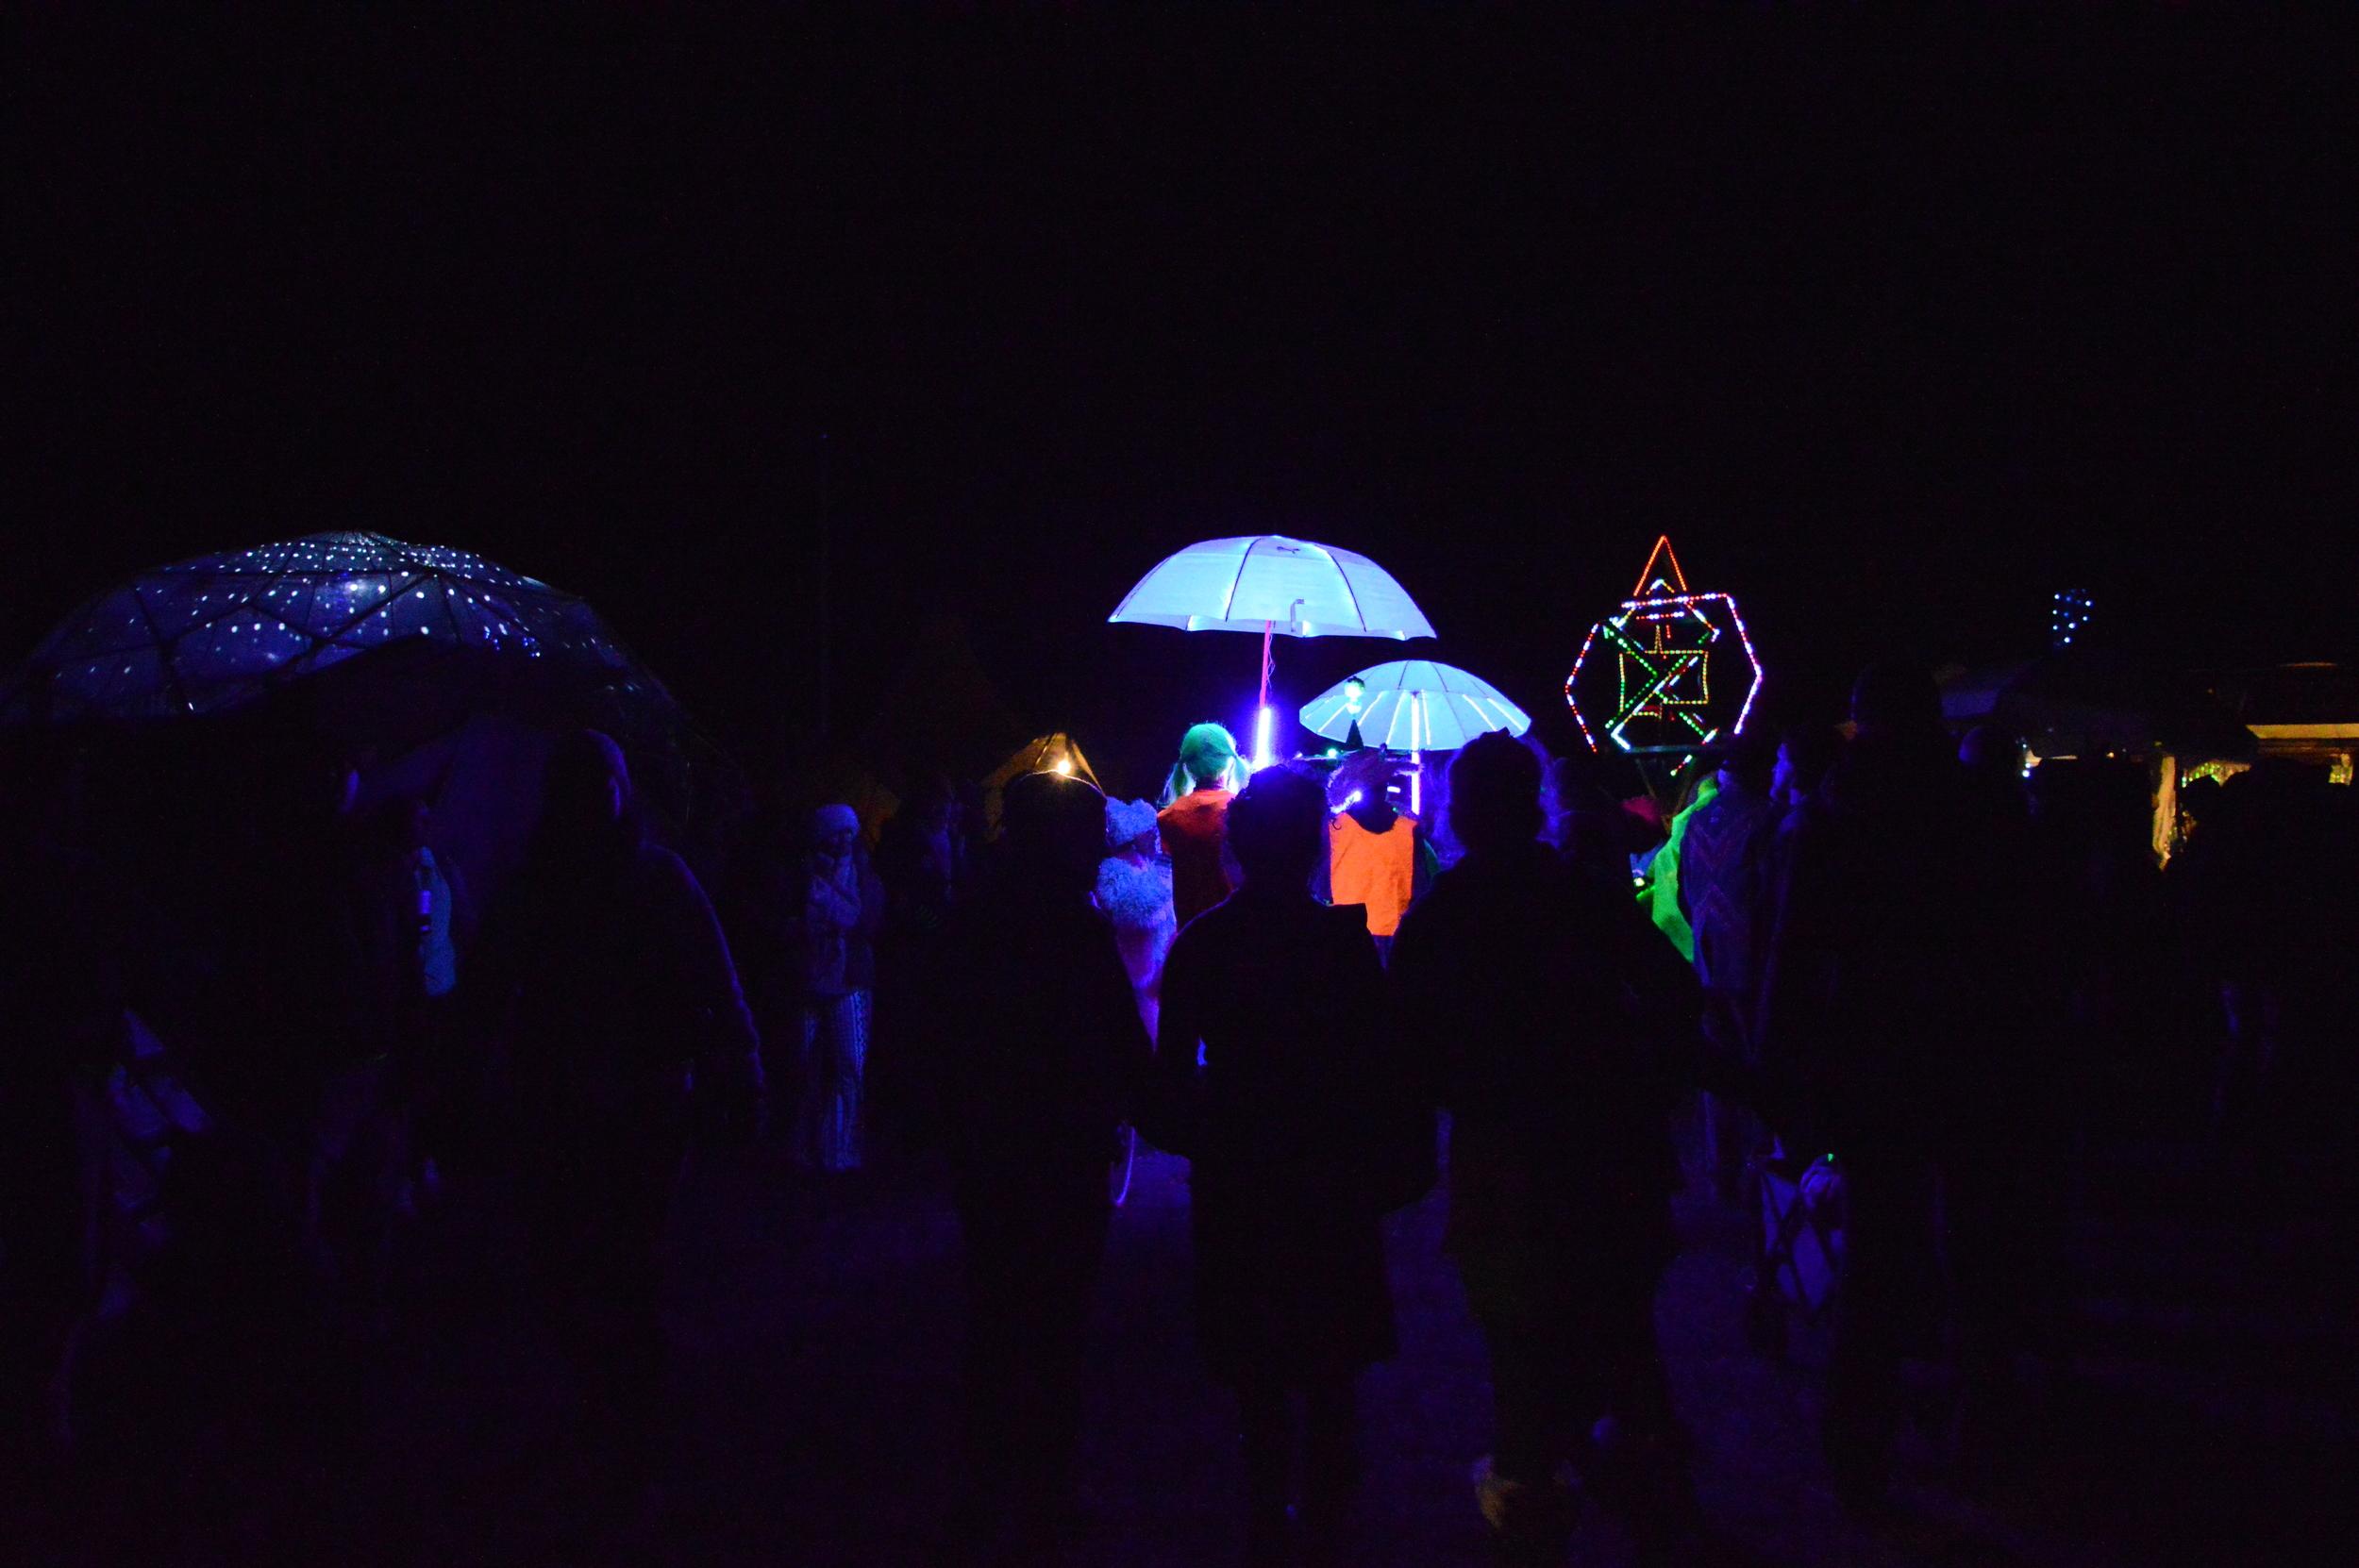 Crazy Neon parade